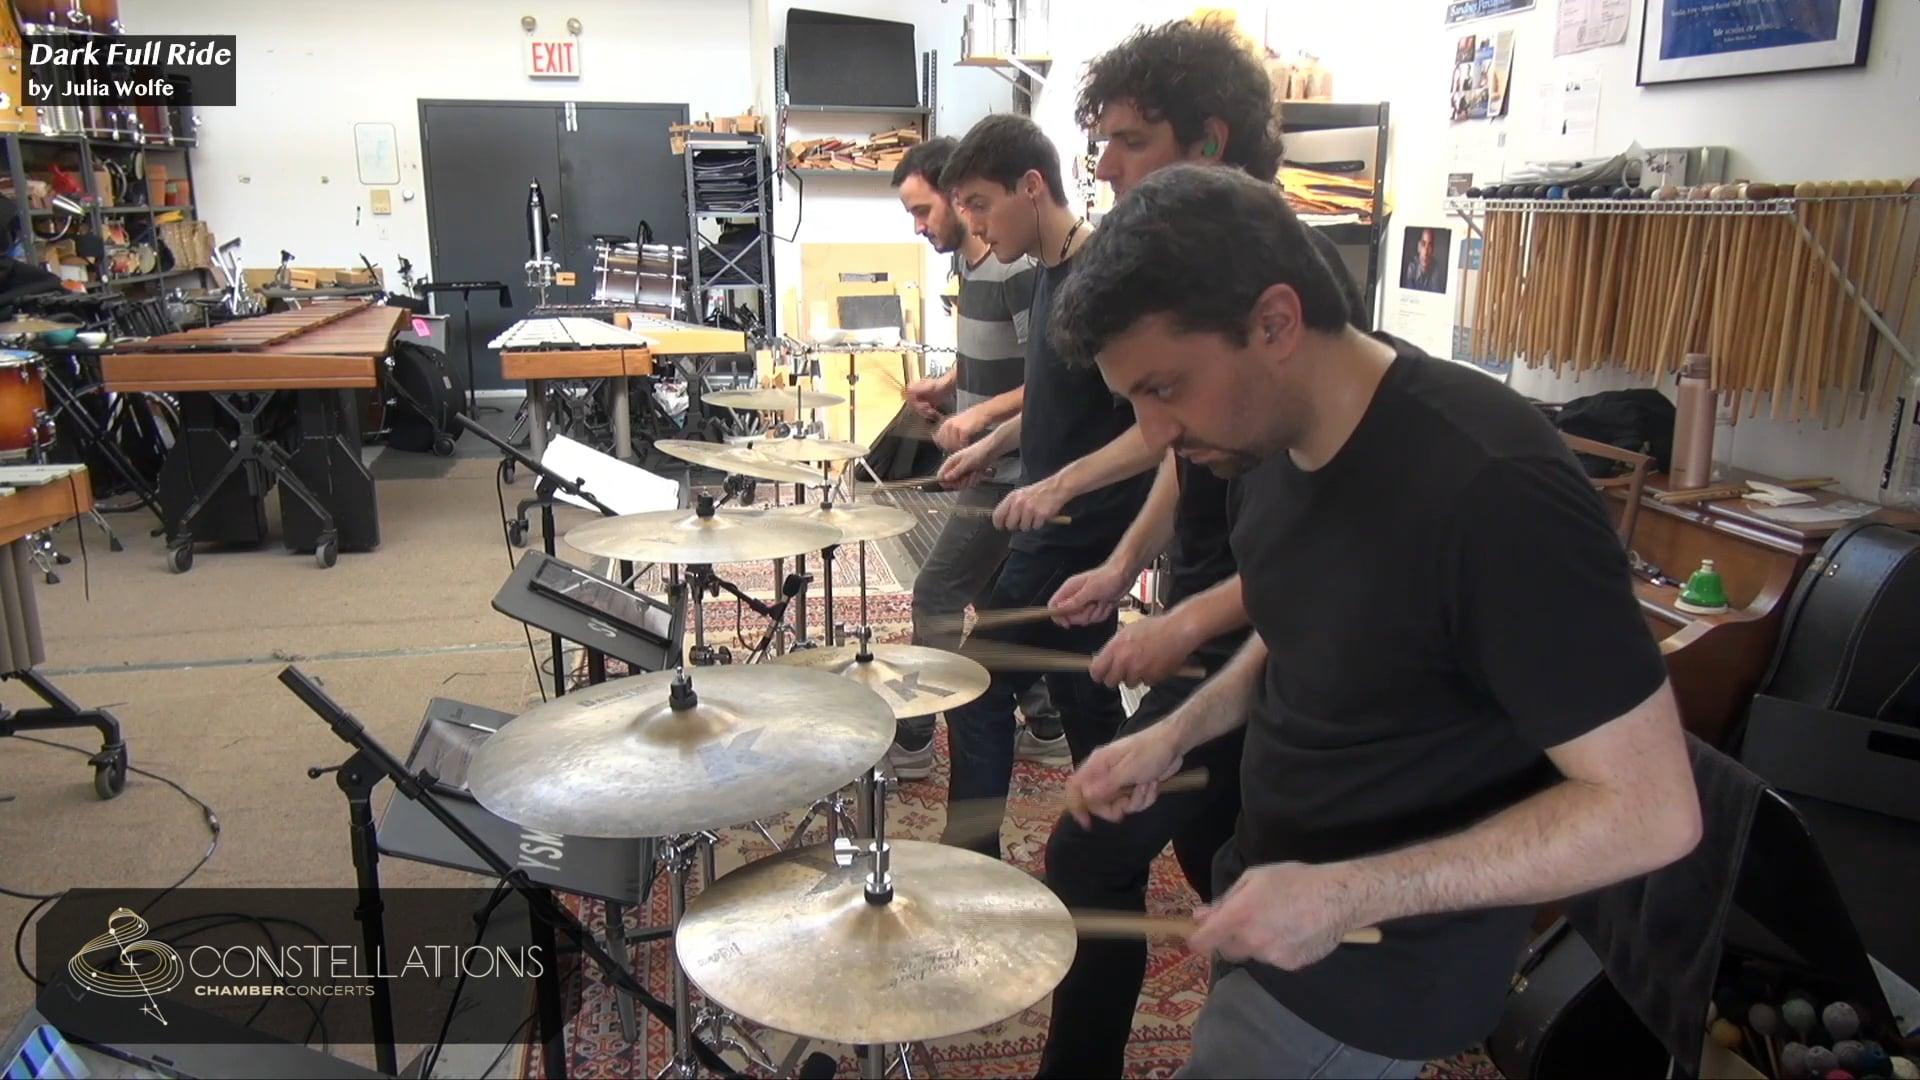 Sandbox Percussion: Dark Full Ride by Julia Wolfe